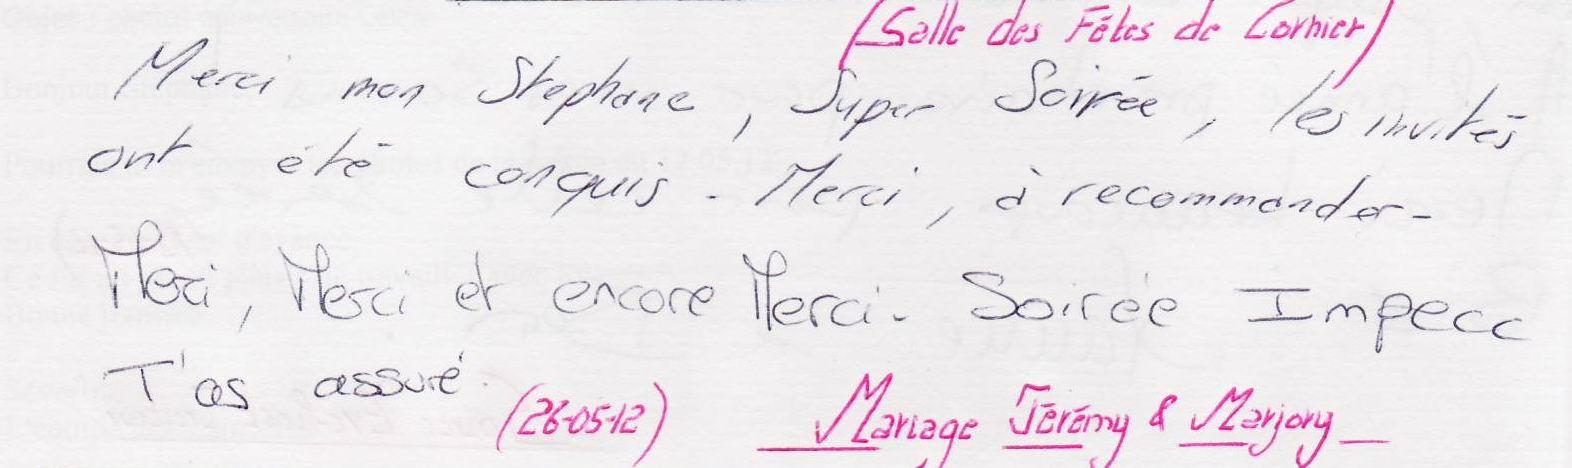 Mariage CORNIER (26-05-2012)